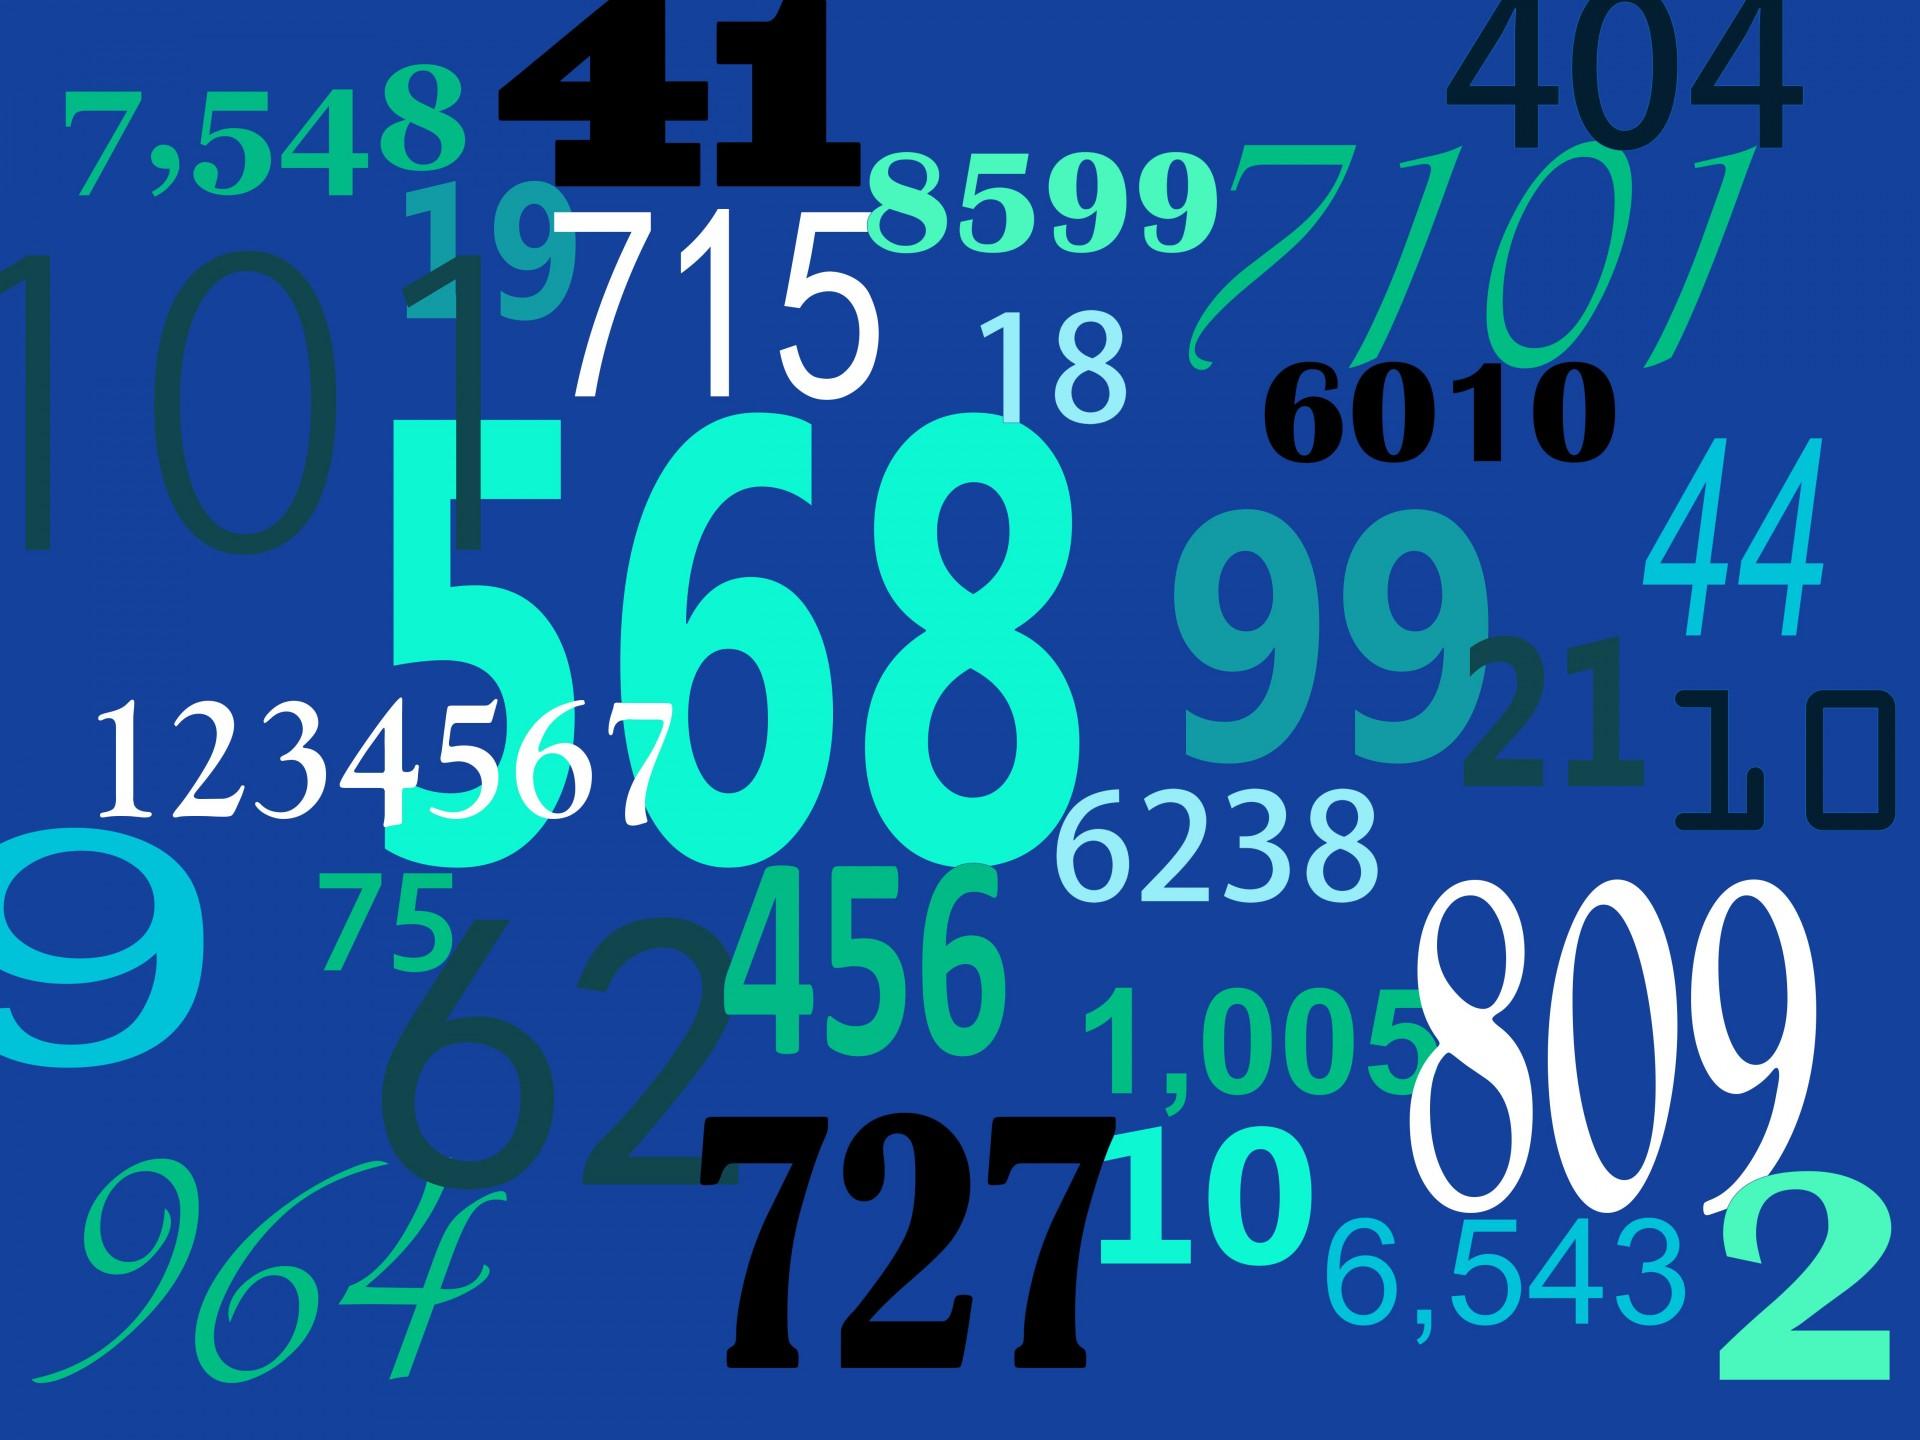 I numeri dell'IVA